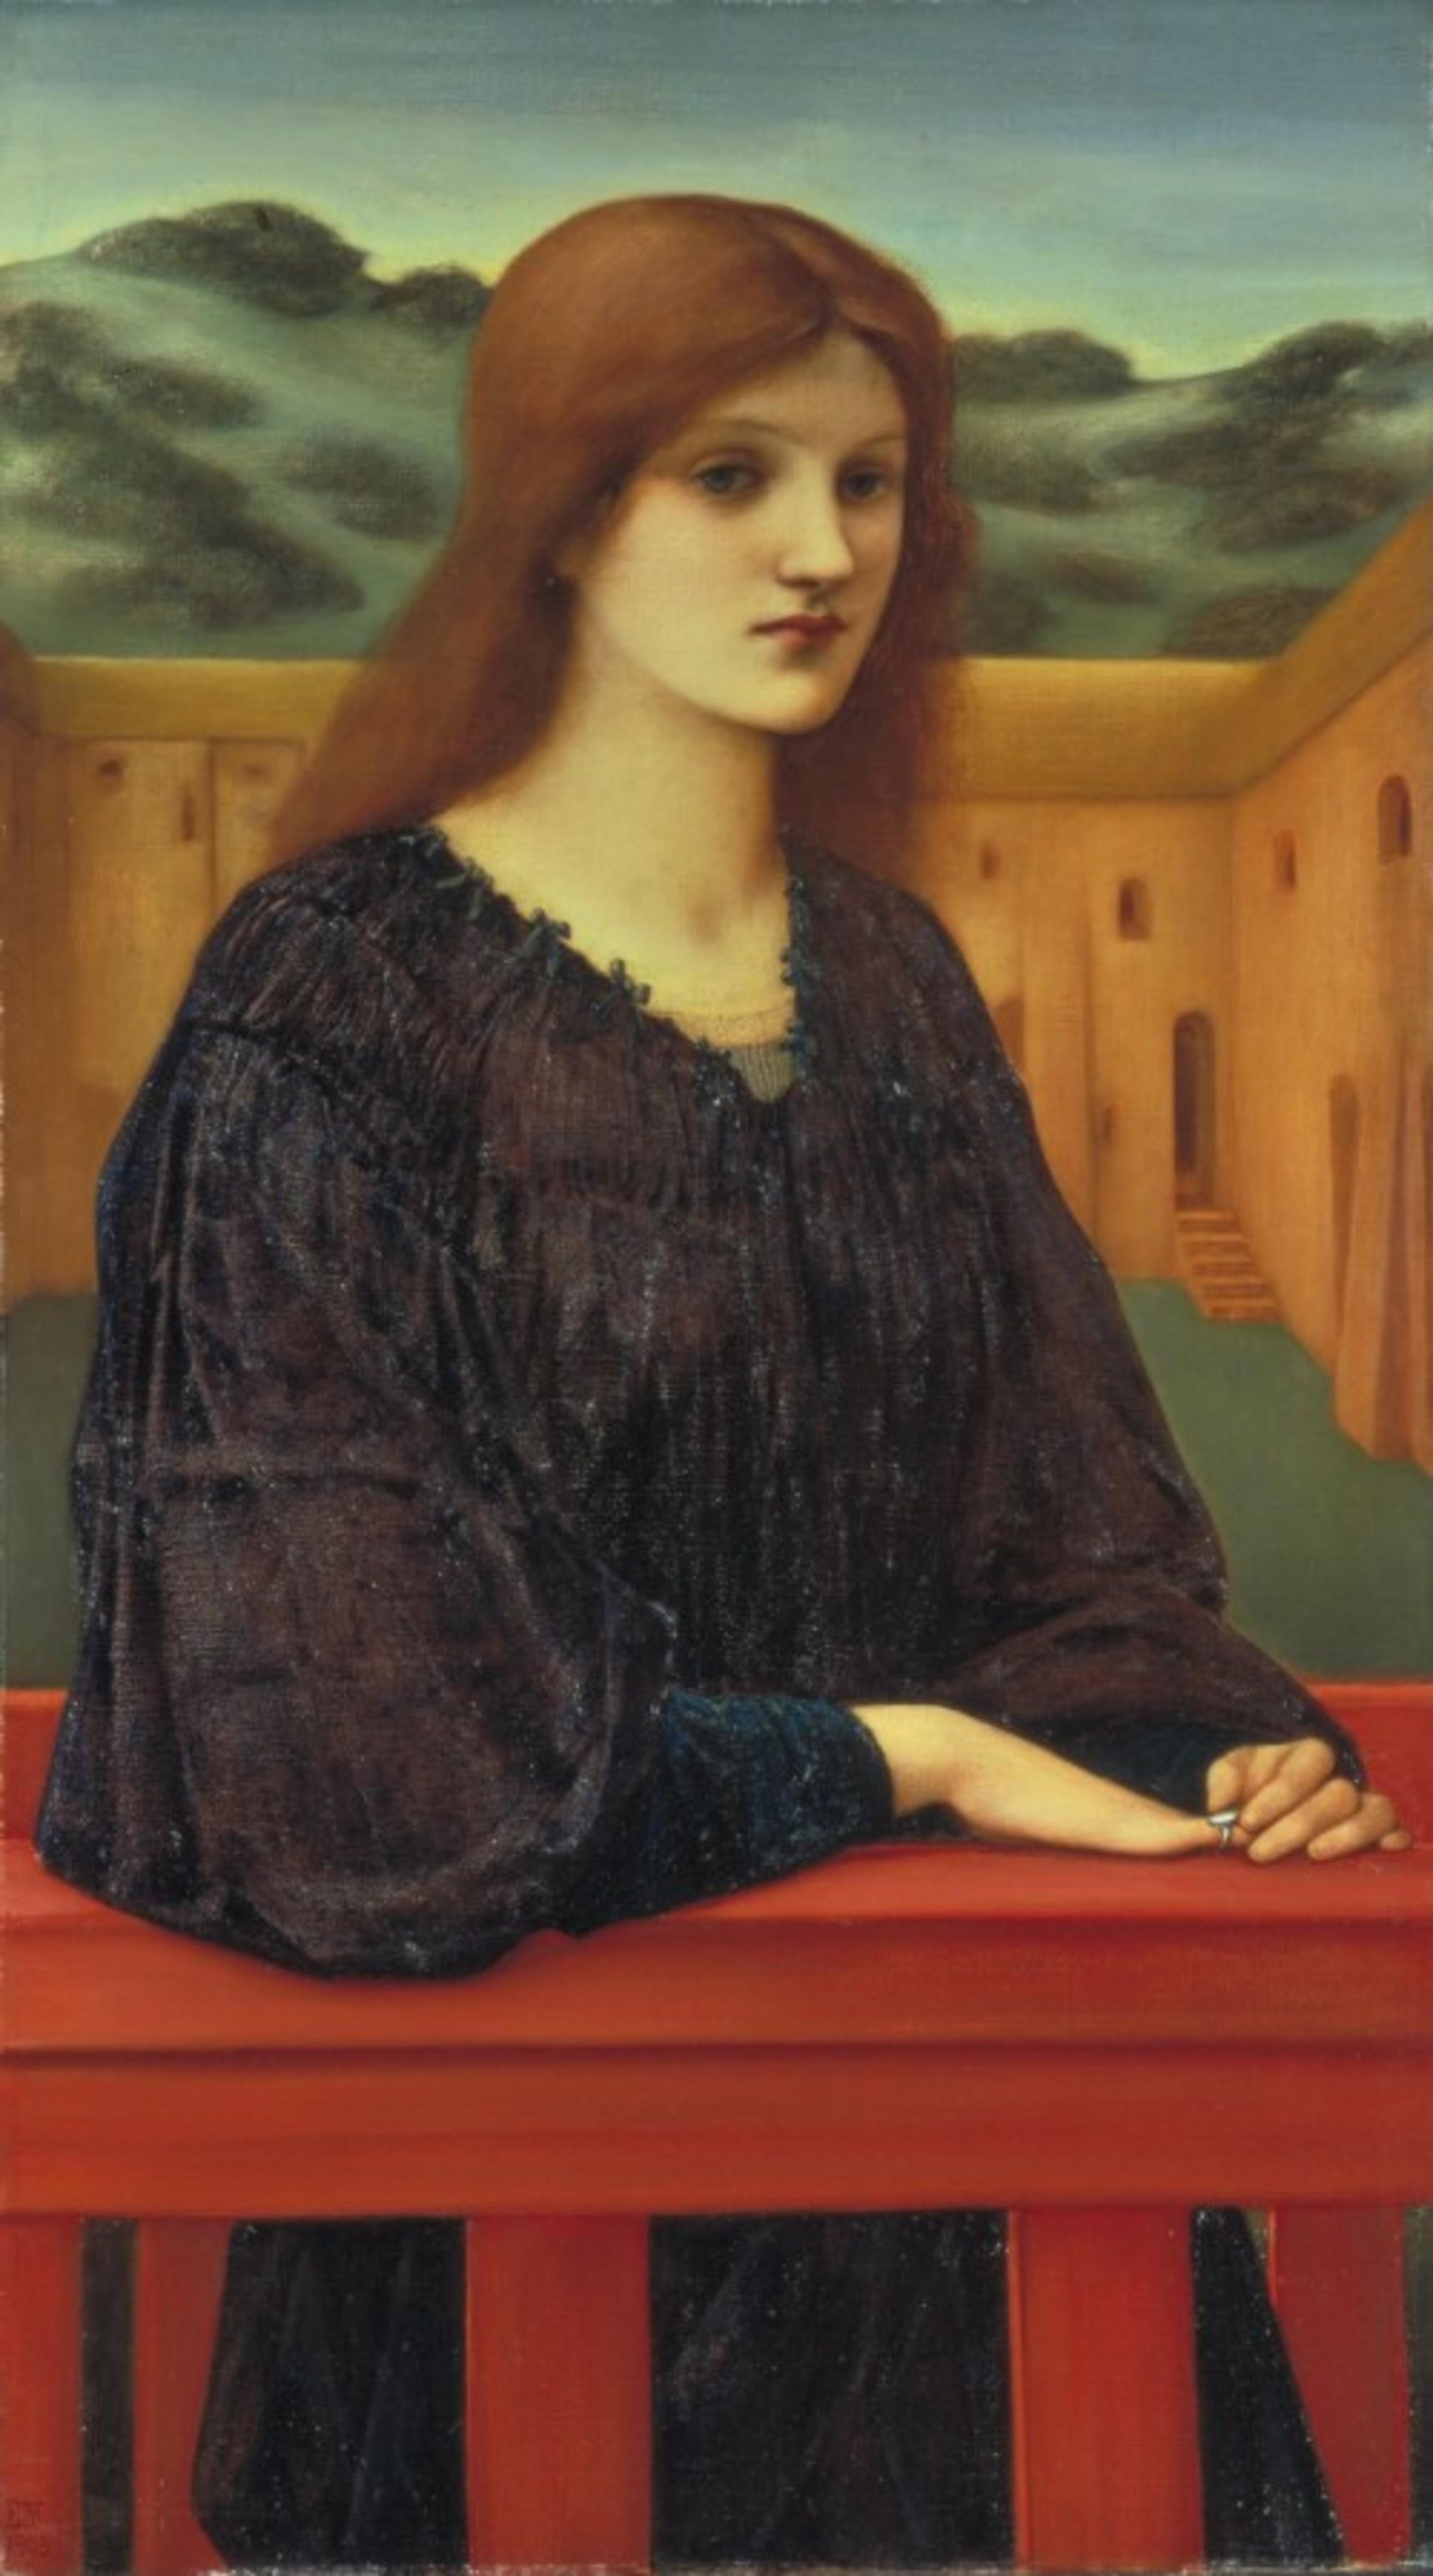 Sir_Edward_Coley_Burne-Jones_-_Vespertina_Quies_-_Google_Art_Project.jpg